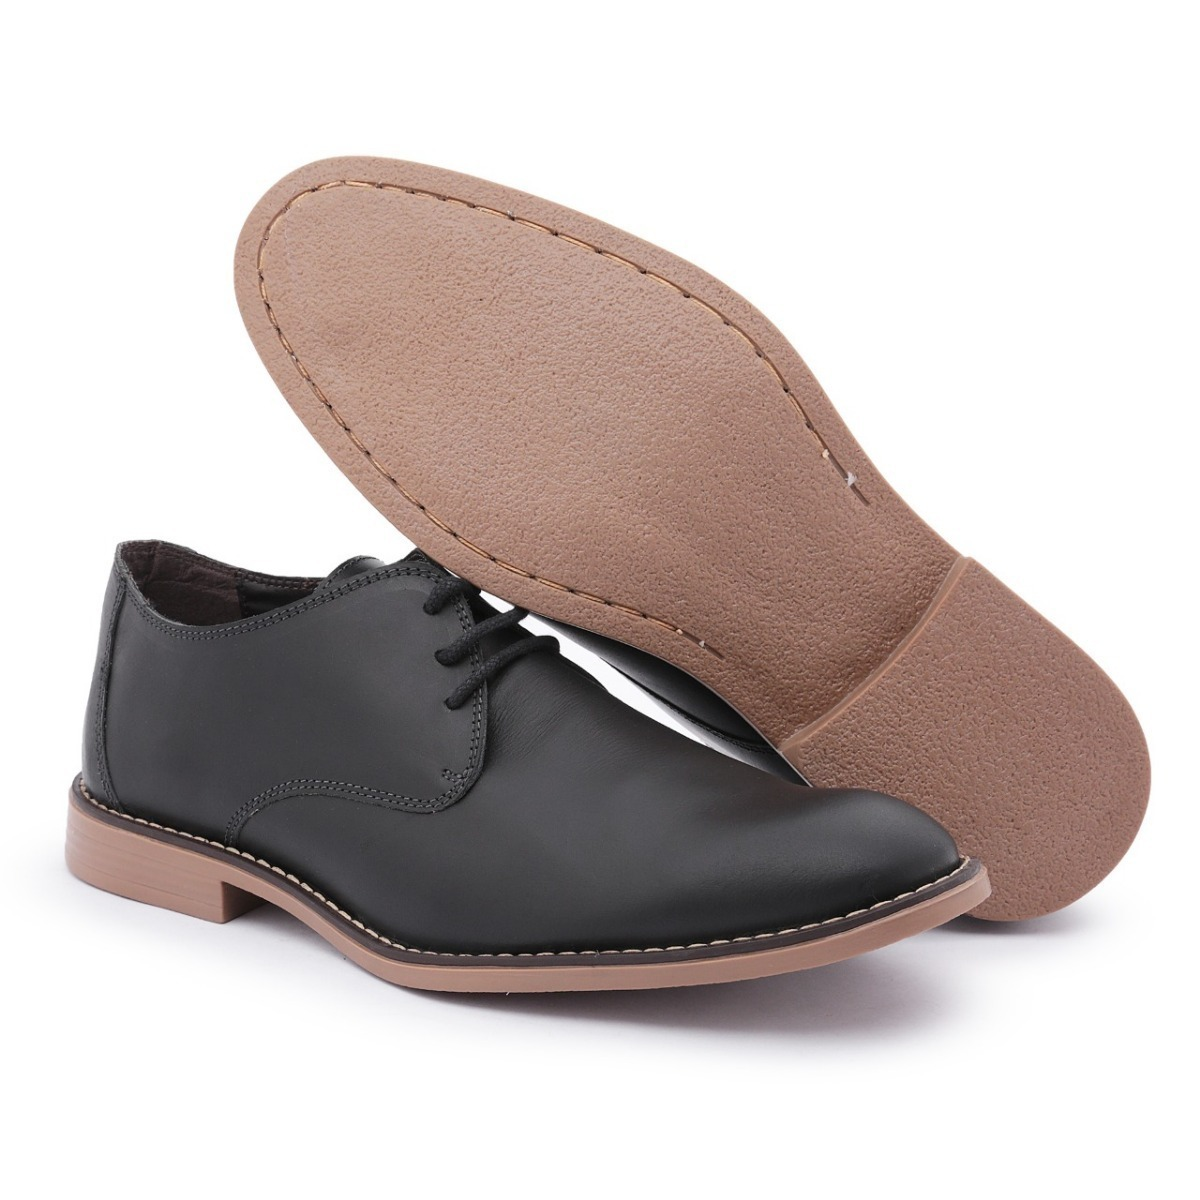 93c2b029c sapatos da moda masculino couro legítimo social casual. Carregando zoom.